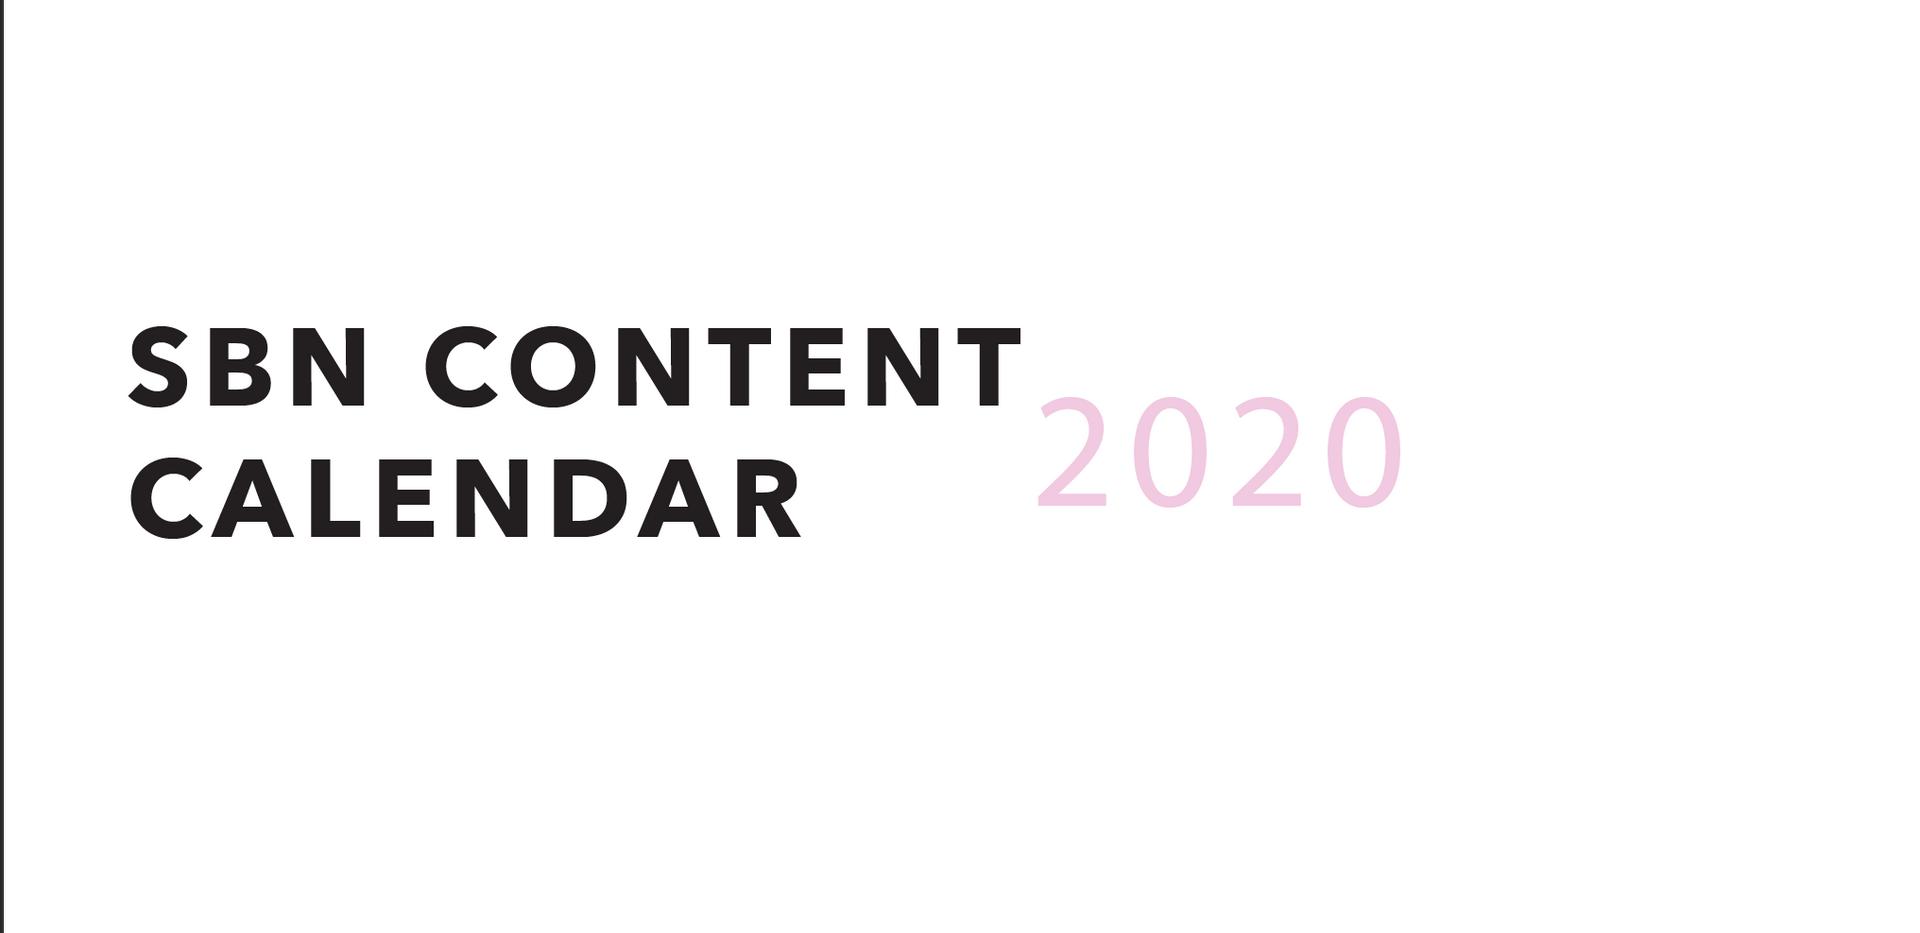 SBN Content Calendar 2020